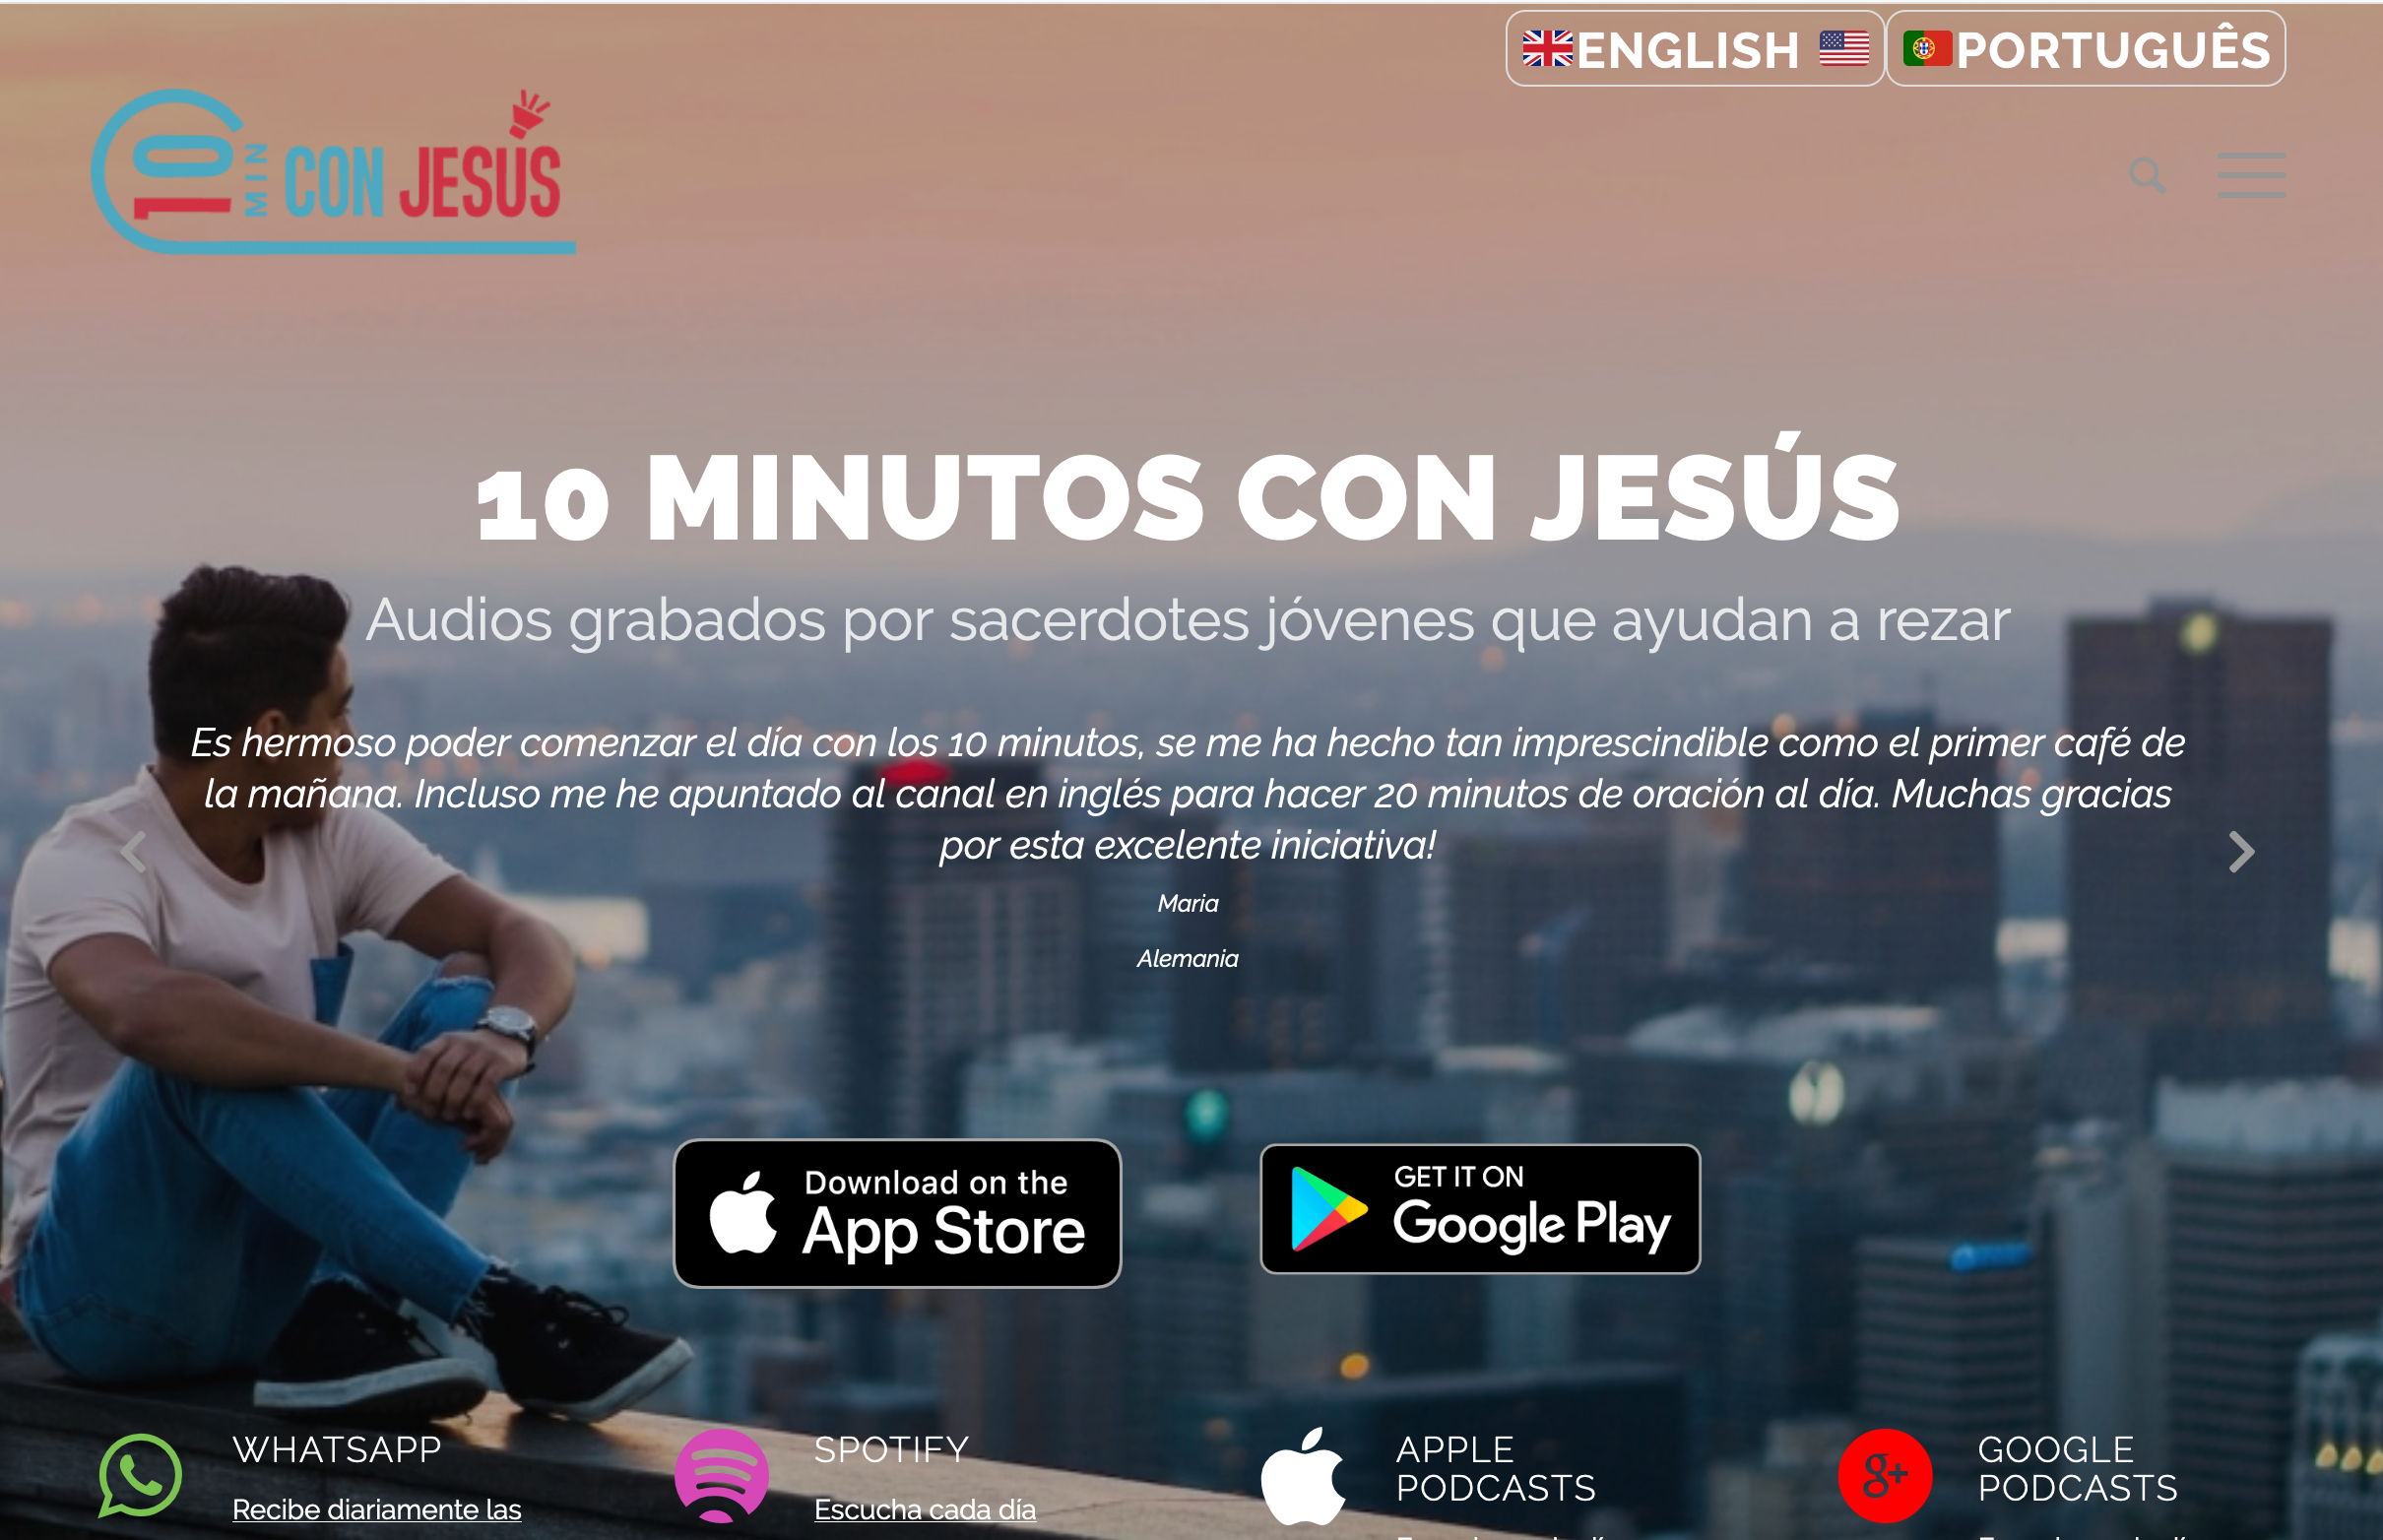 10minutos con jesus org